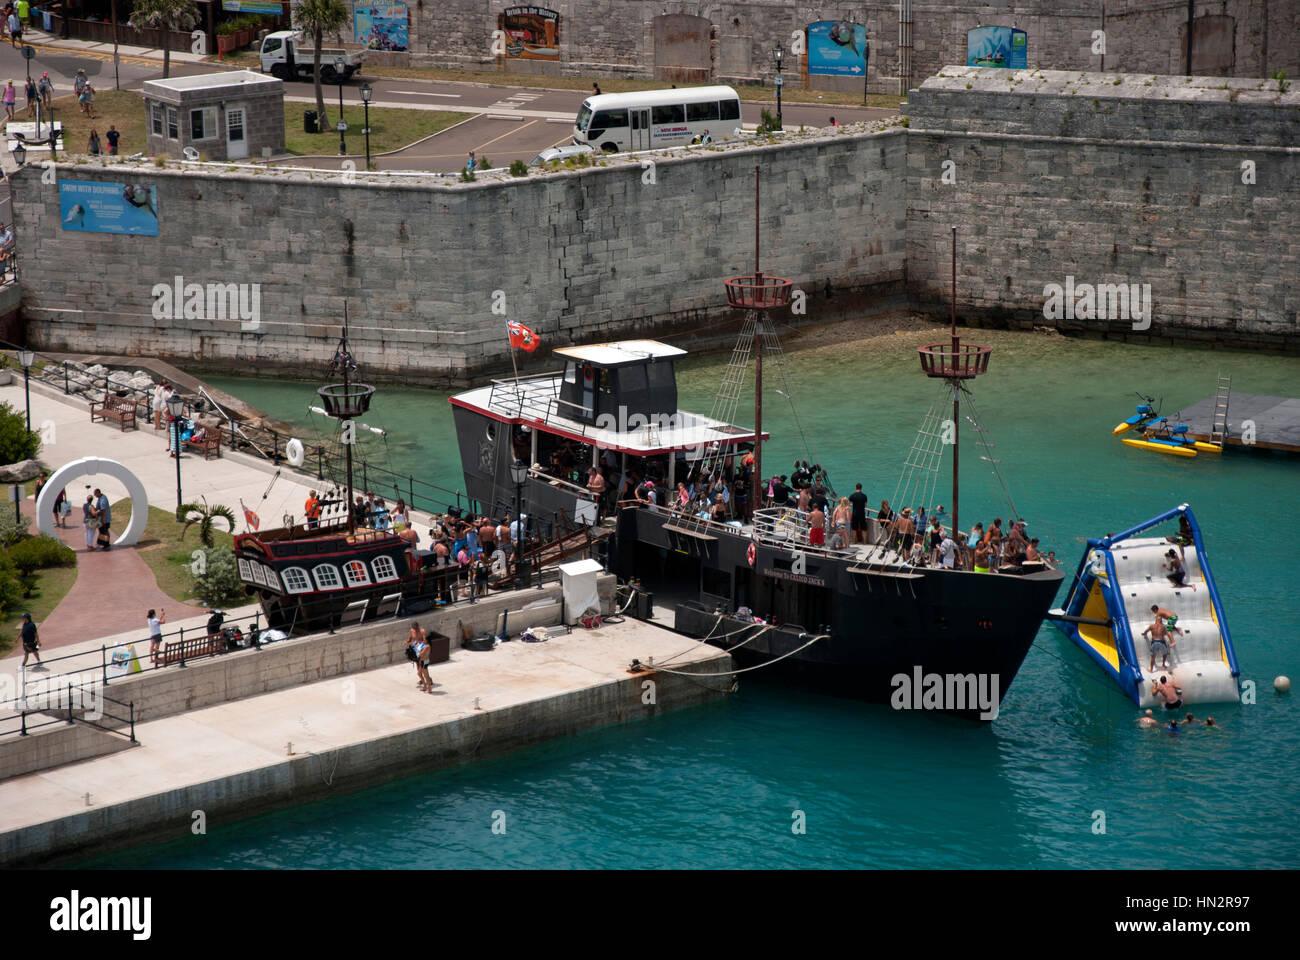 Royal Naval Ship Calico Pirate Dockyard Photo Jack's Bermuda Stock 6vYf7gby